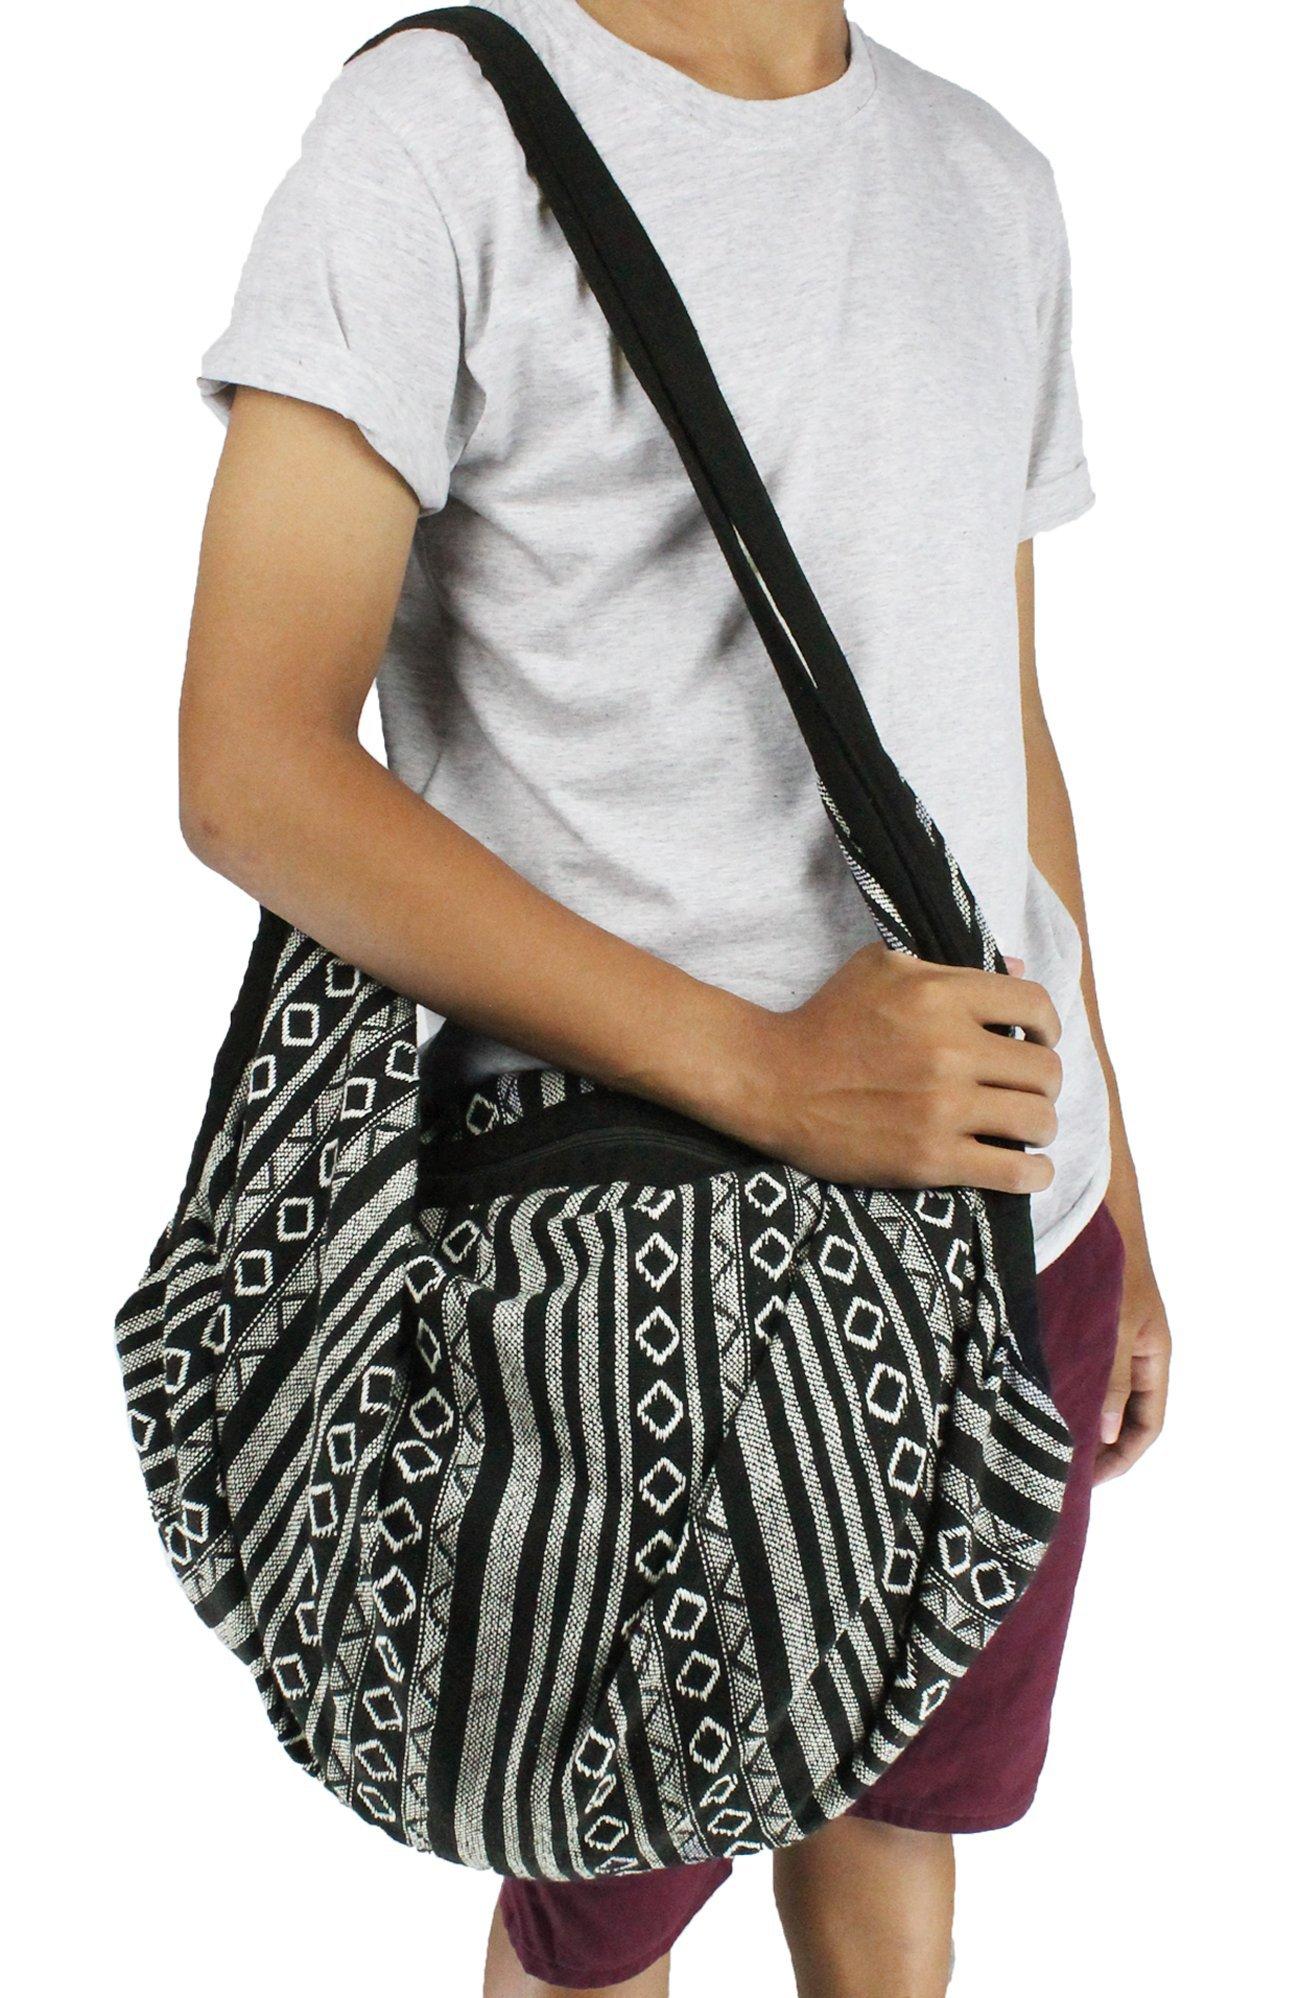 Thai Bag Tribal Bag Hmong Bag Boho Bag Striped Bag Ethnic Striped Thai Cotton Boho Sling Tribal Crossbody Bag Backpack Shoulder Bag Thai Pattern Bag Thai Top Zip Handmade Asia Bag (Stripe Black2)